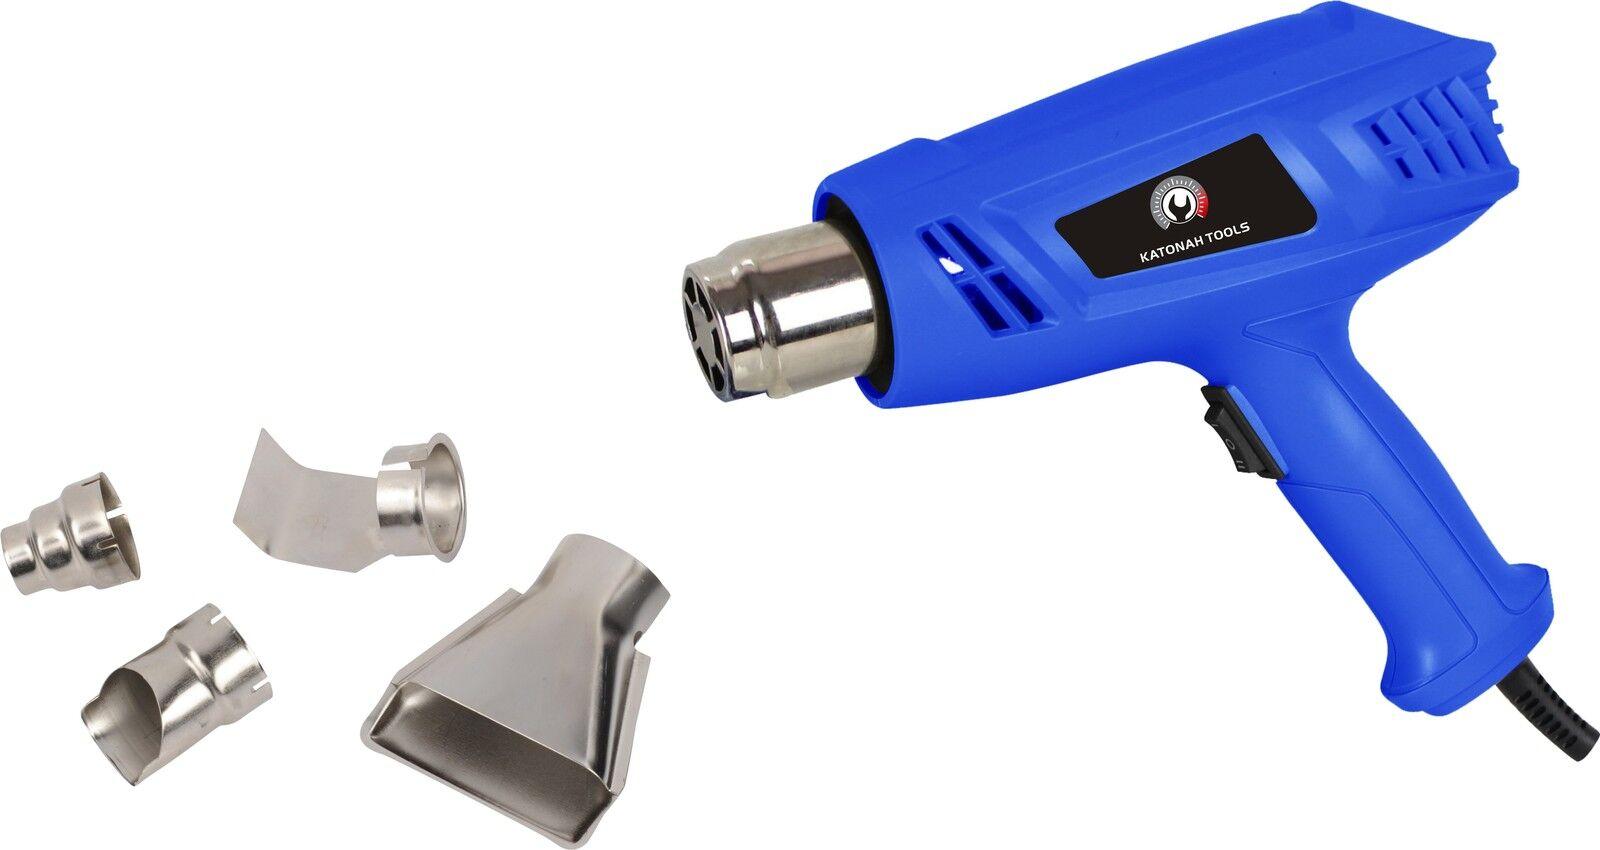 New Heat Gun Hot Air Gun Dual Temperature+4 Nozzles Power Tool 1500 W Heater Gun